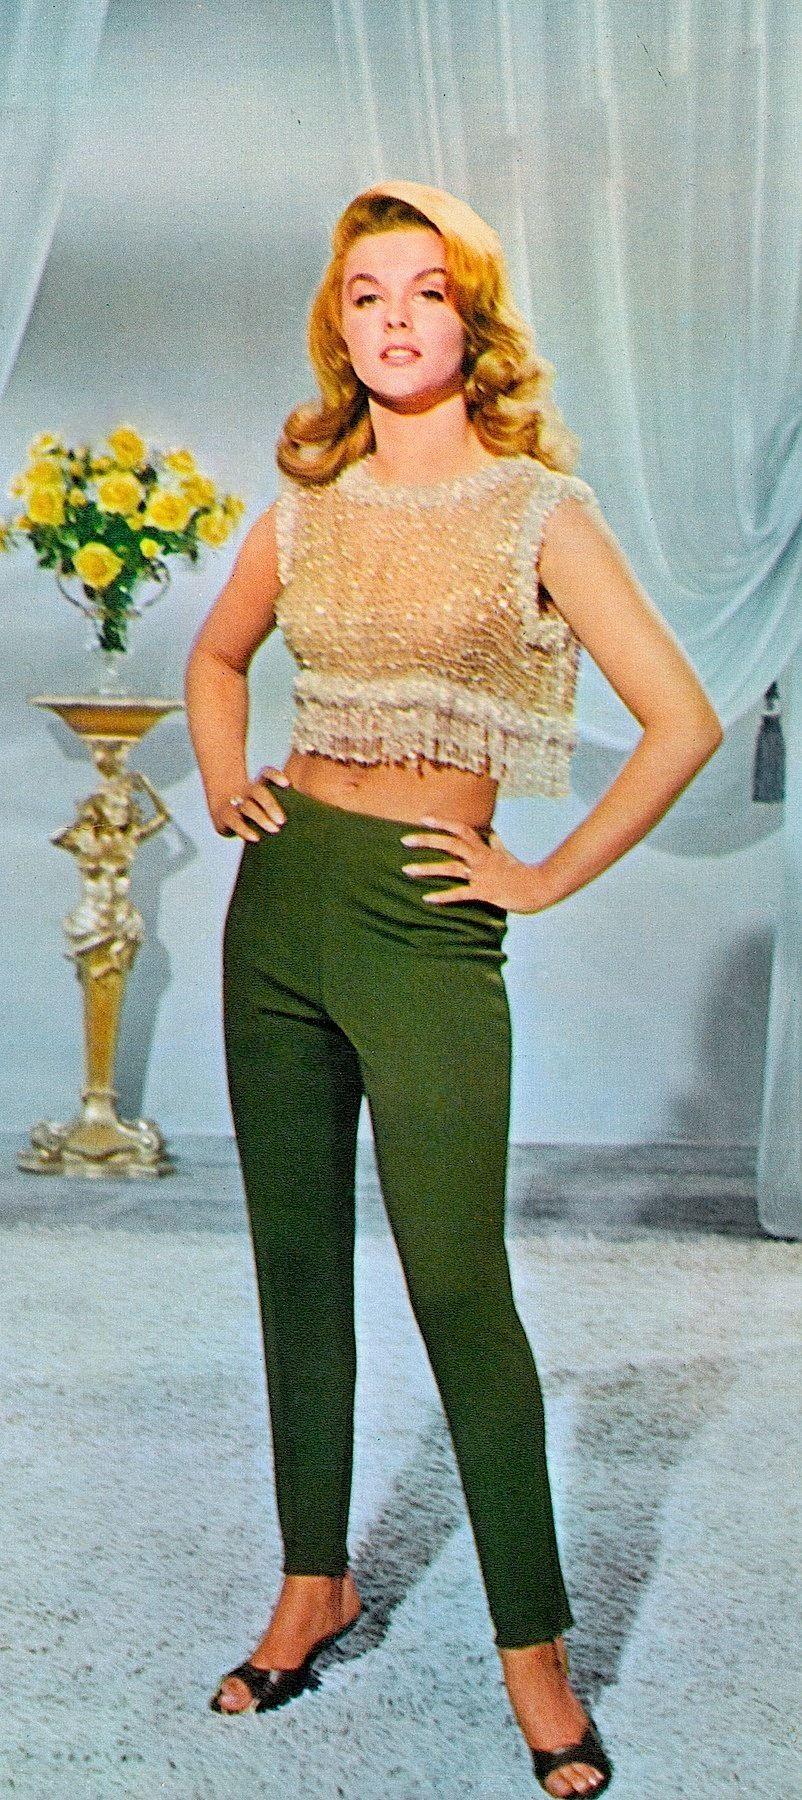 Ann margret actress singer screen magazine japan may 1965 please